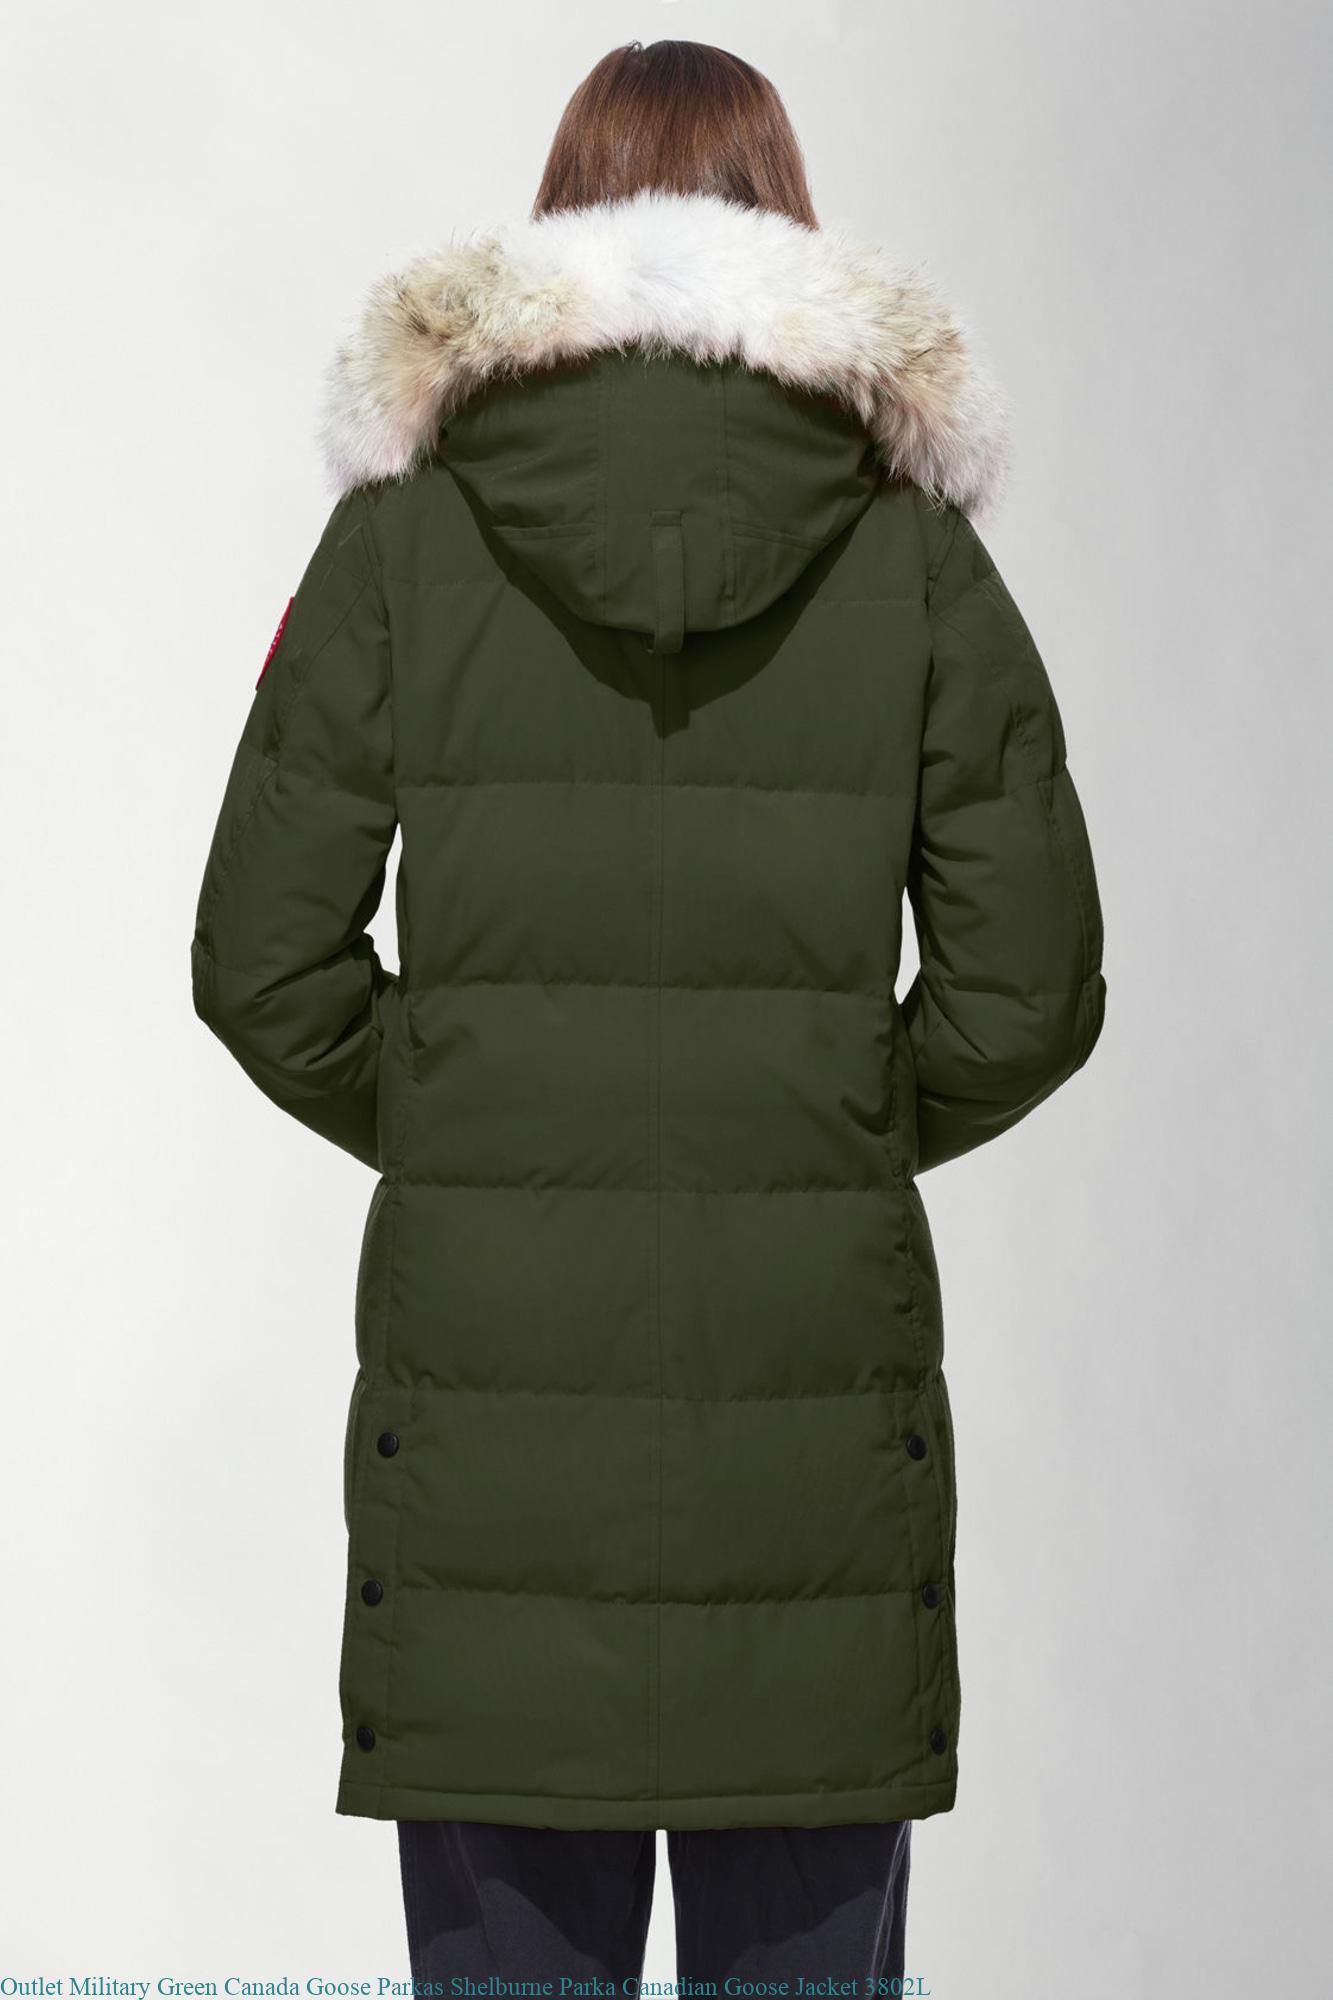 sale retailer 4e529 59750 Outlet Military Green Canada Goose Parkas Shelburne Parka Canadian Goose  Jacket 3802L